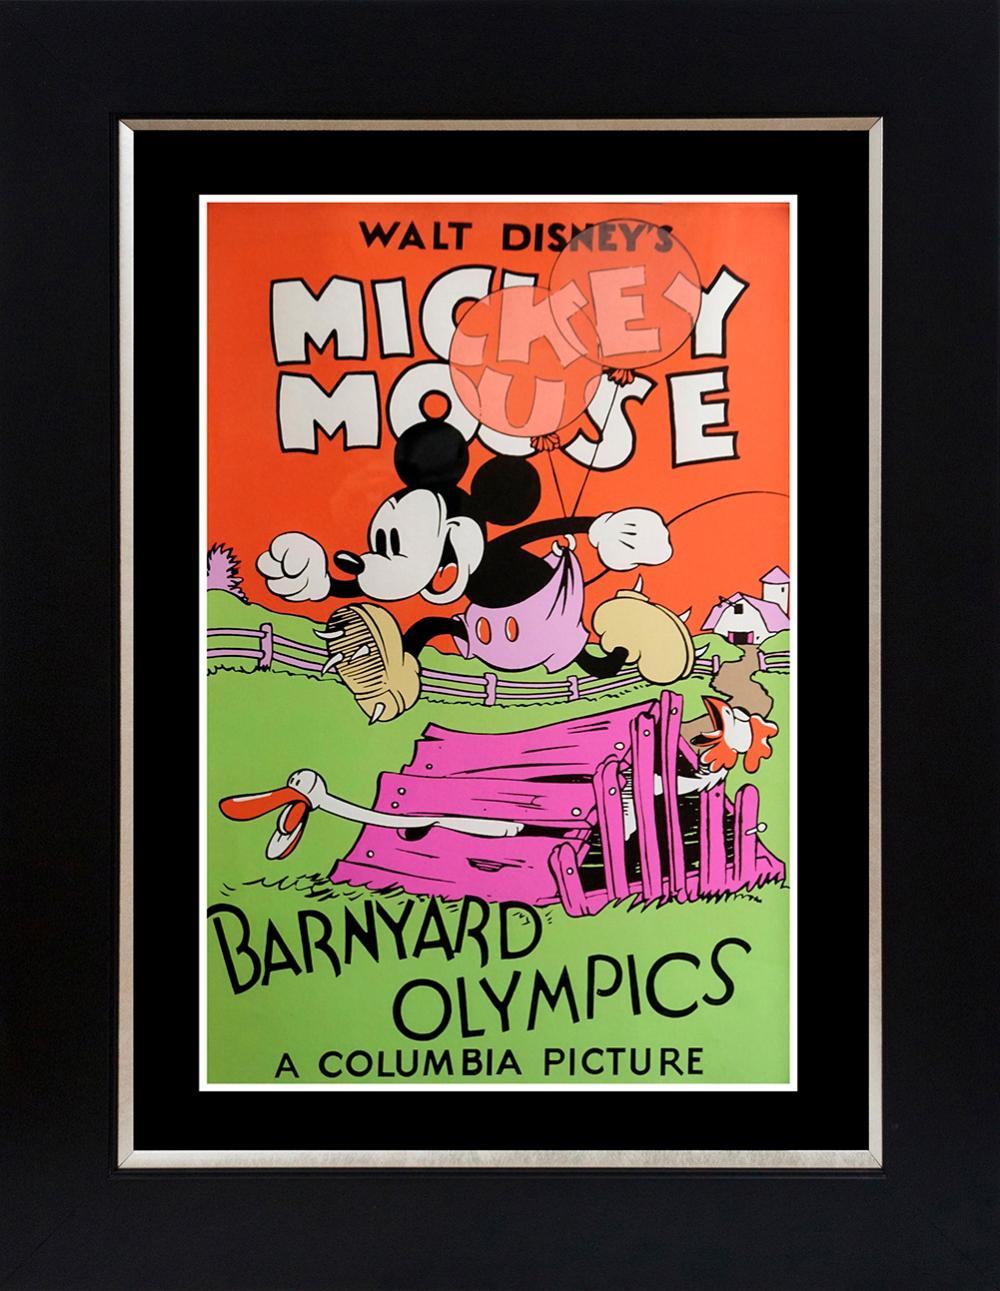 Walt Disney Lithograph Limited Edition